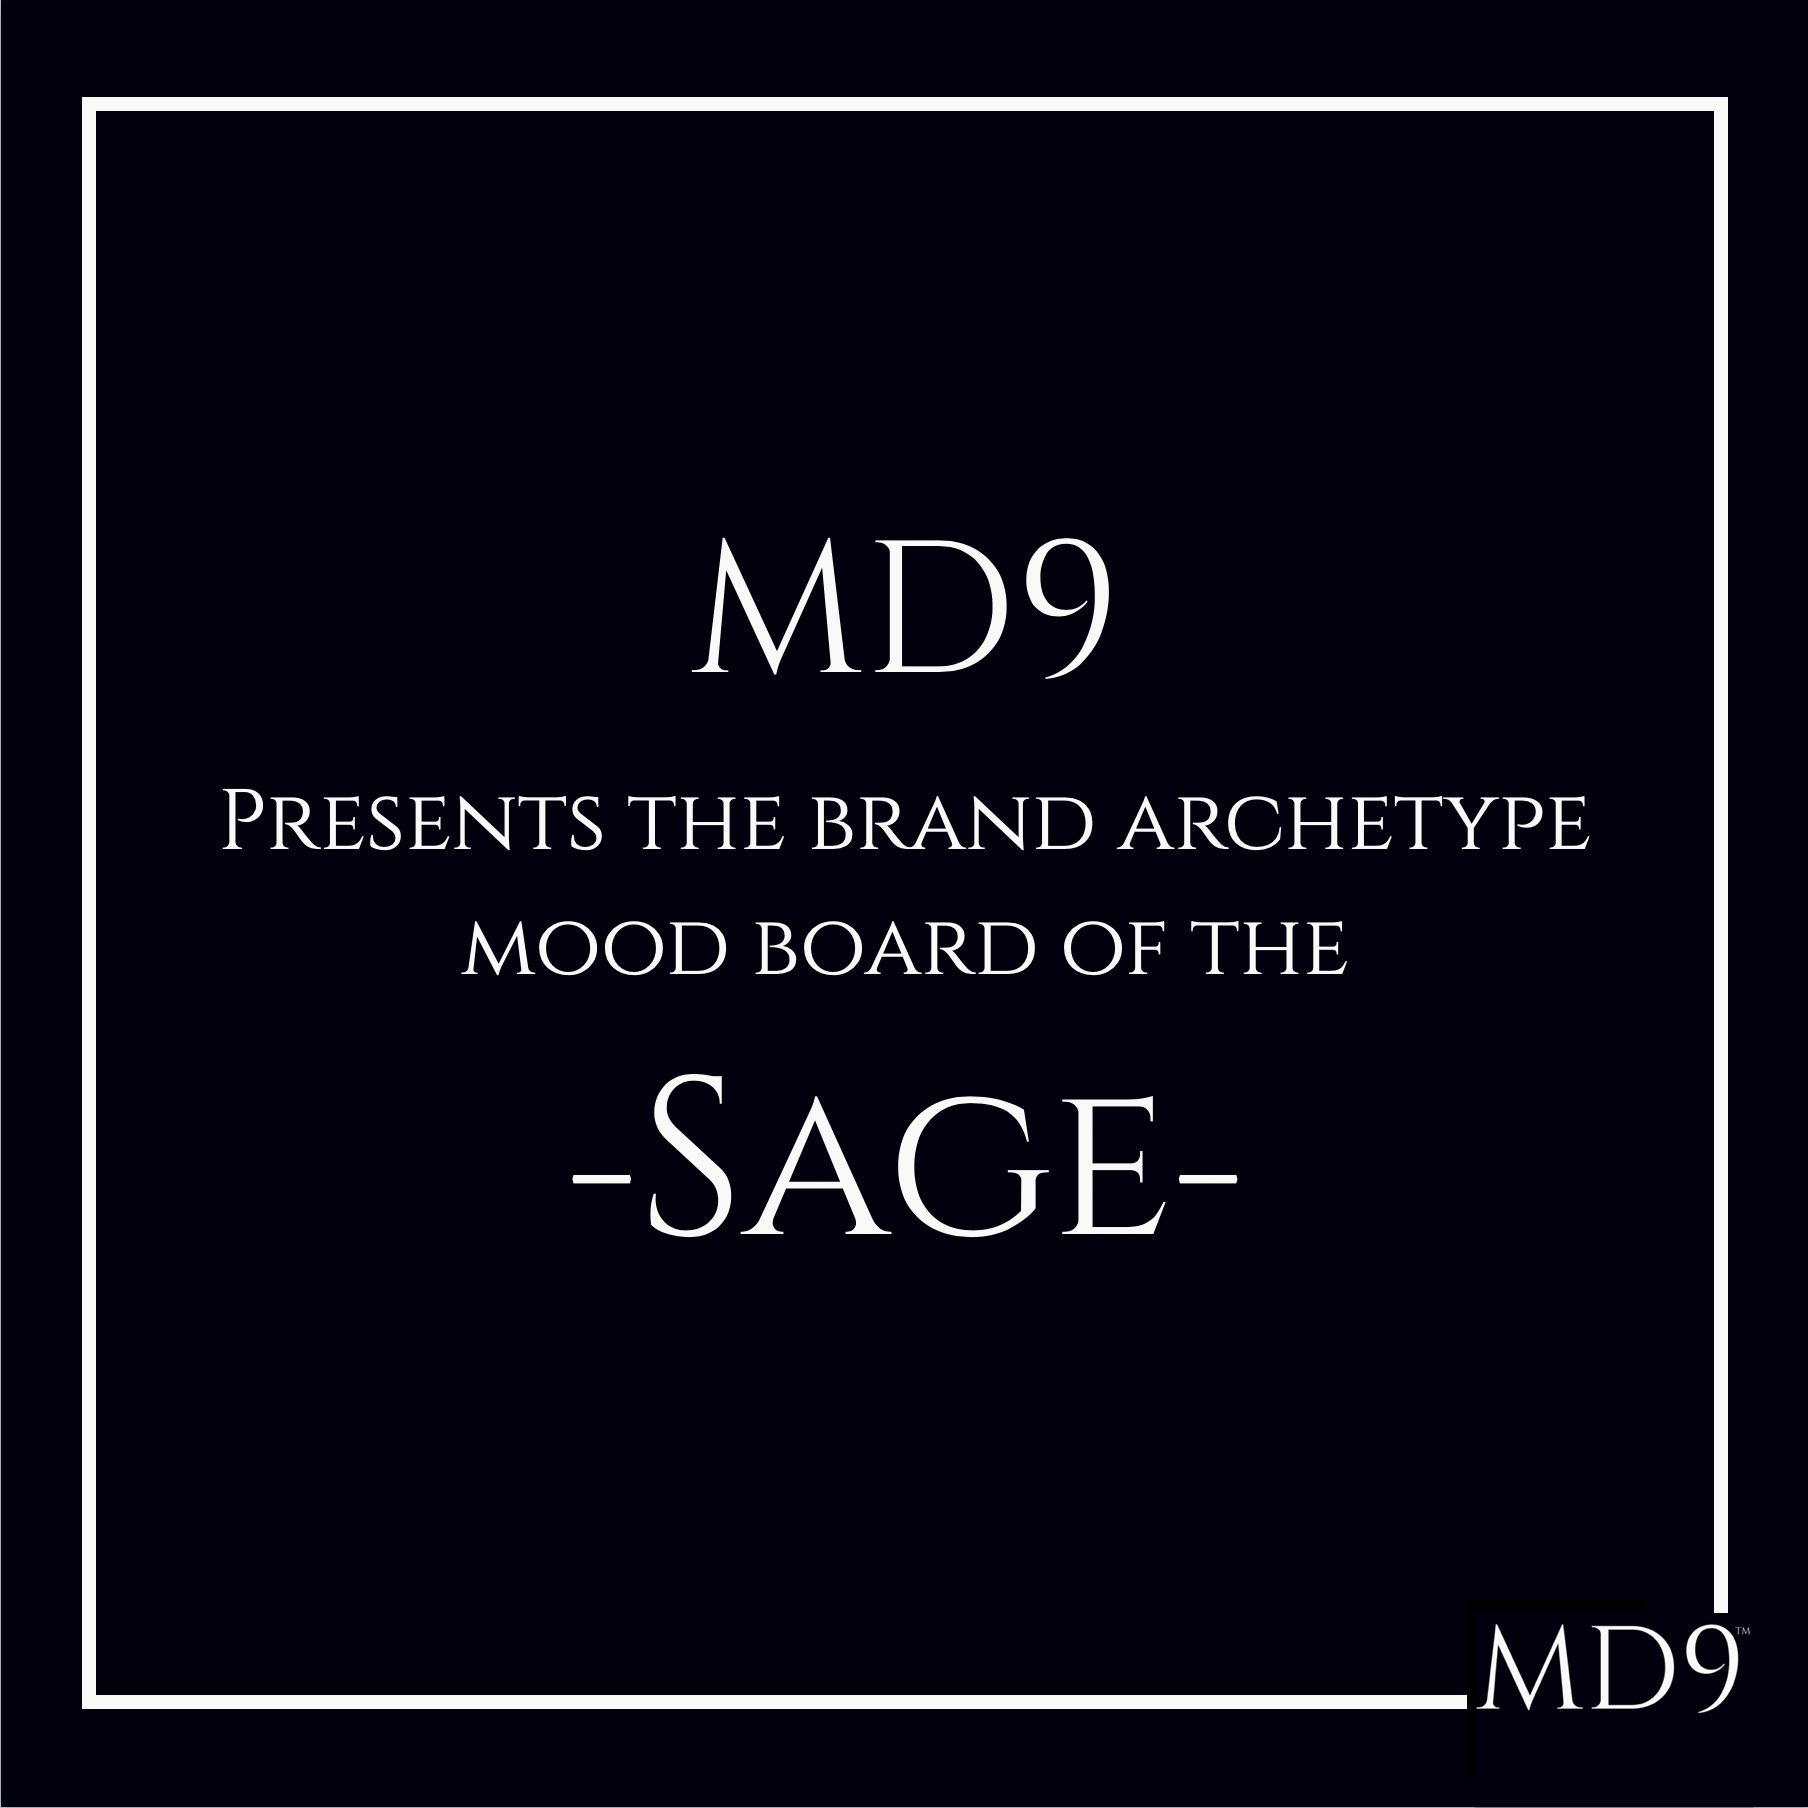 MD9's Brand Archetype Mood Board – Sage